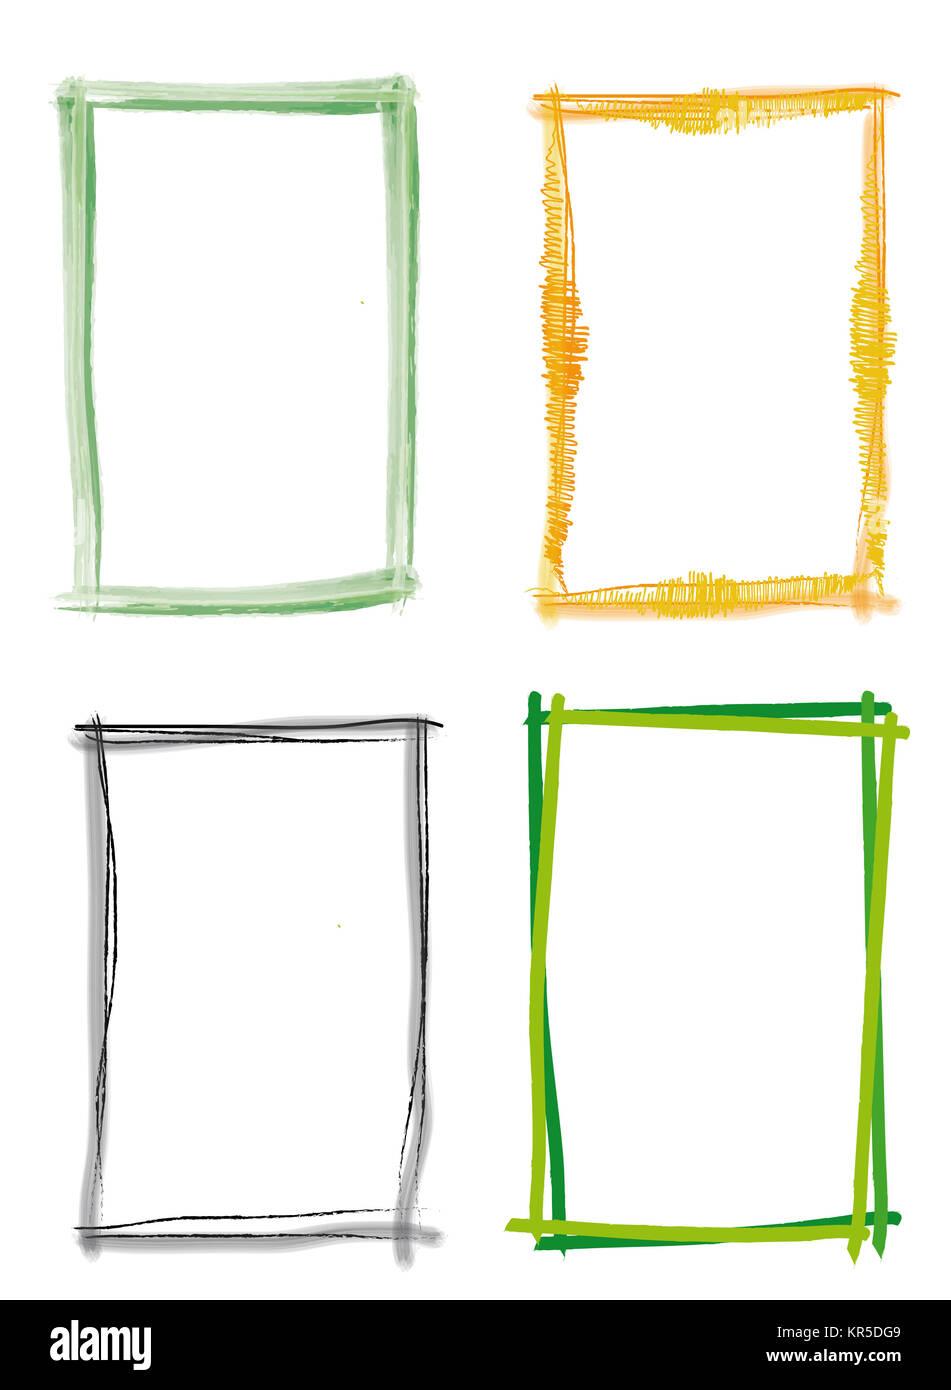 Rahmen Pinsel Strich grün Stock Photo: 169150809 - Alamy